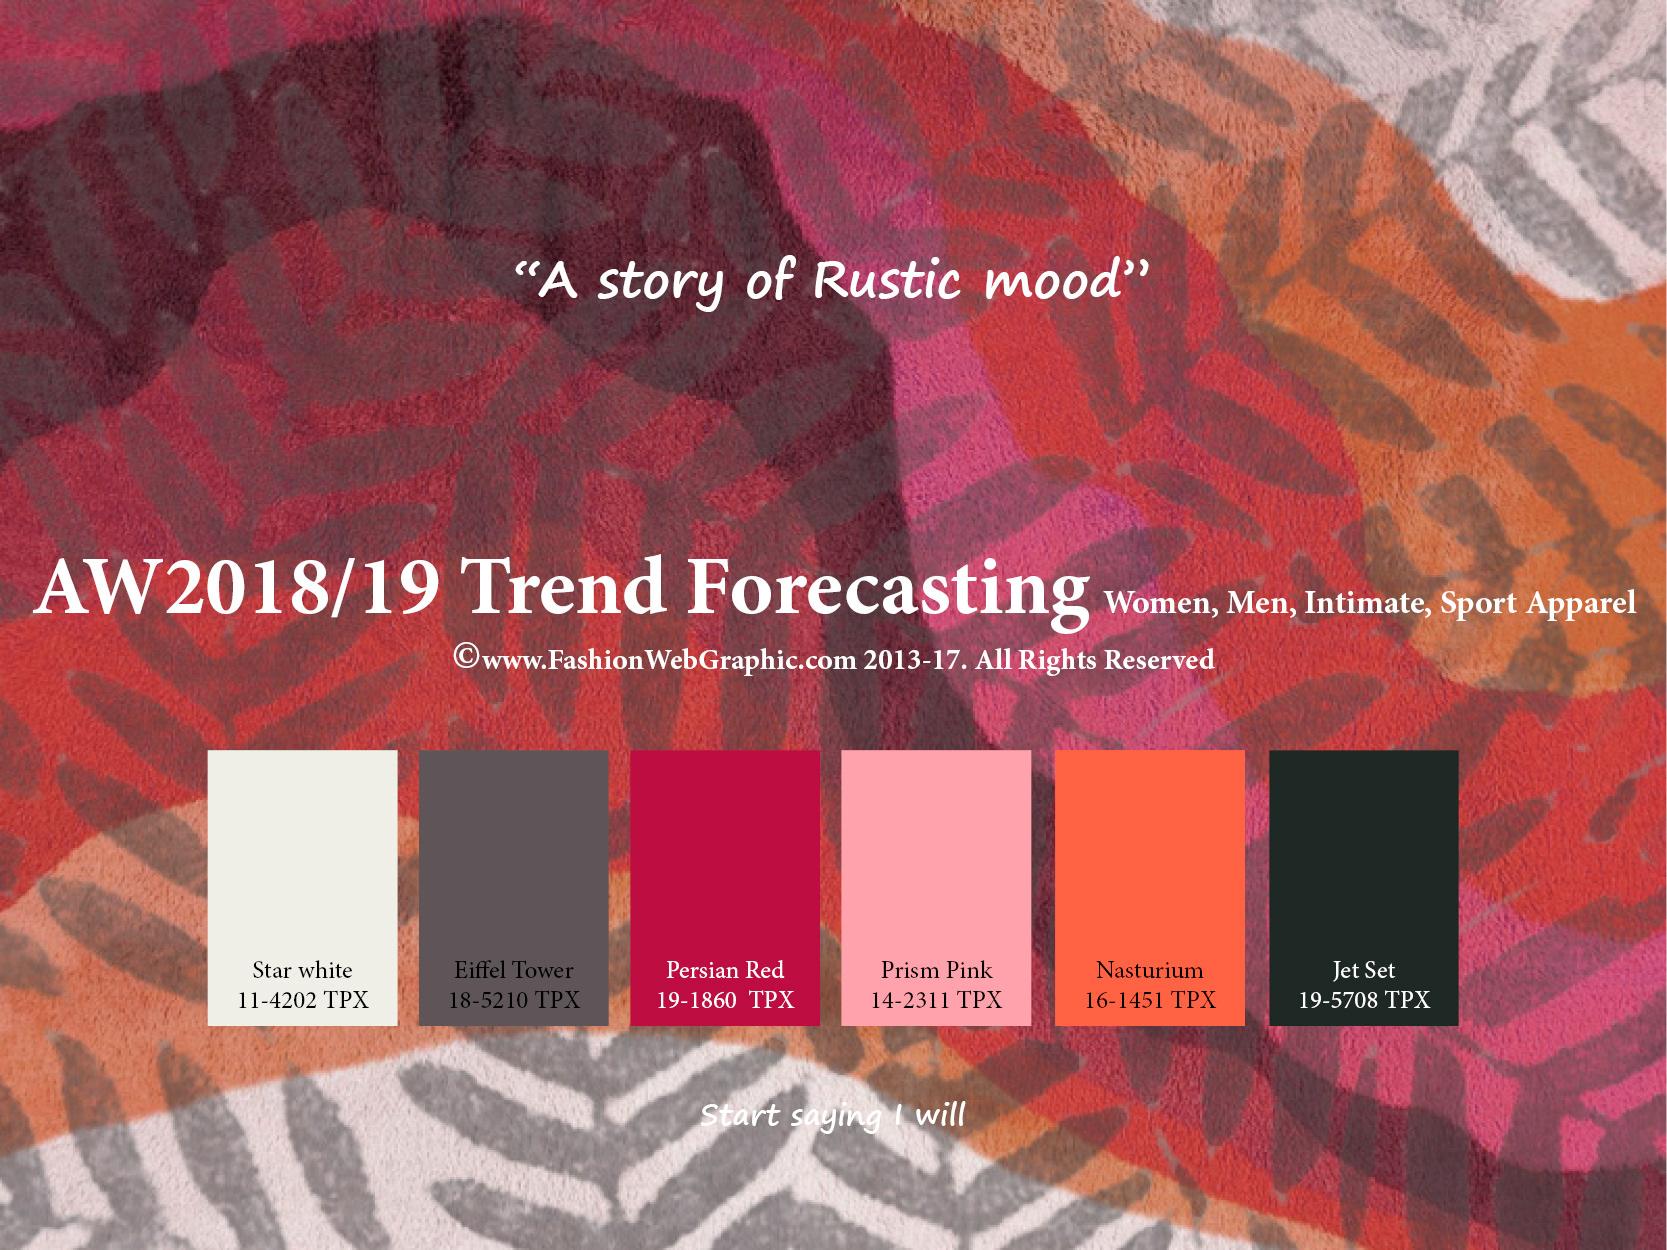 judith ng aw2018 2019 trend forecasting. Black Bedroom Furniture Sets. Home Design Ideas